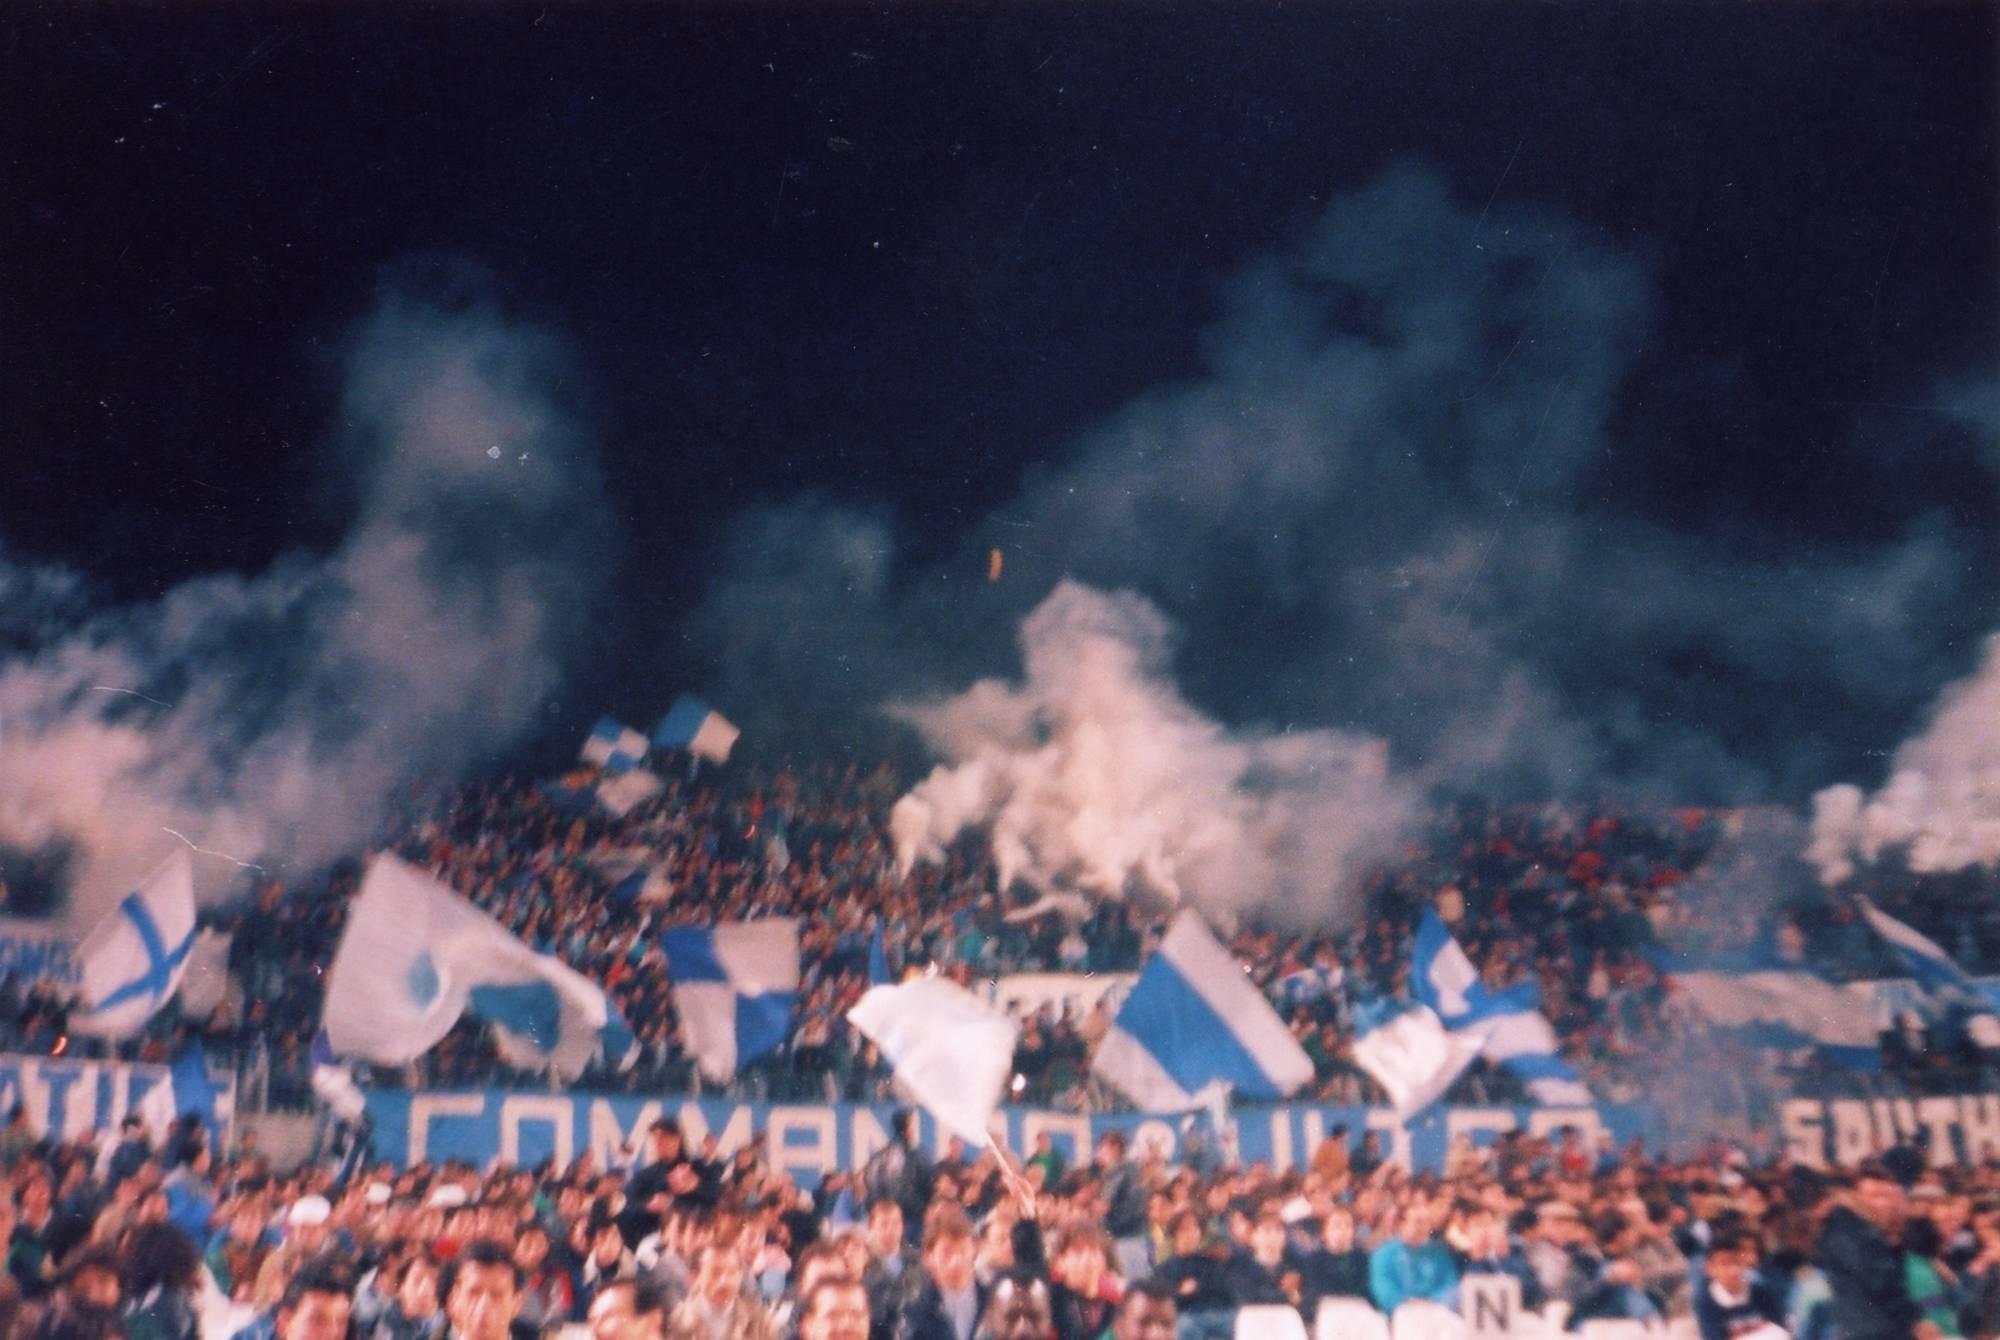 OM - STASBOURG saison 1988/1989